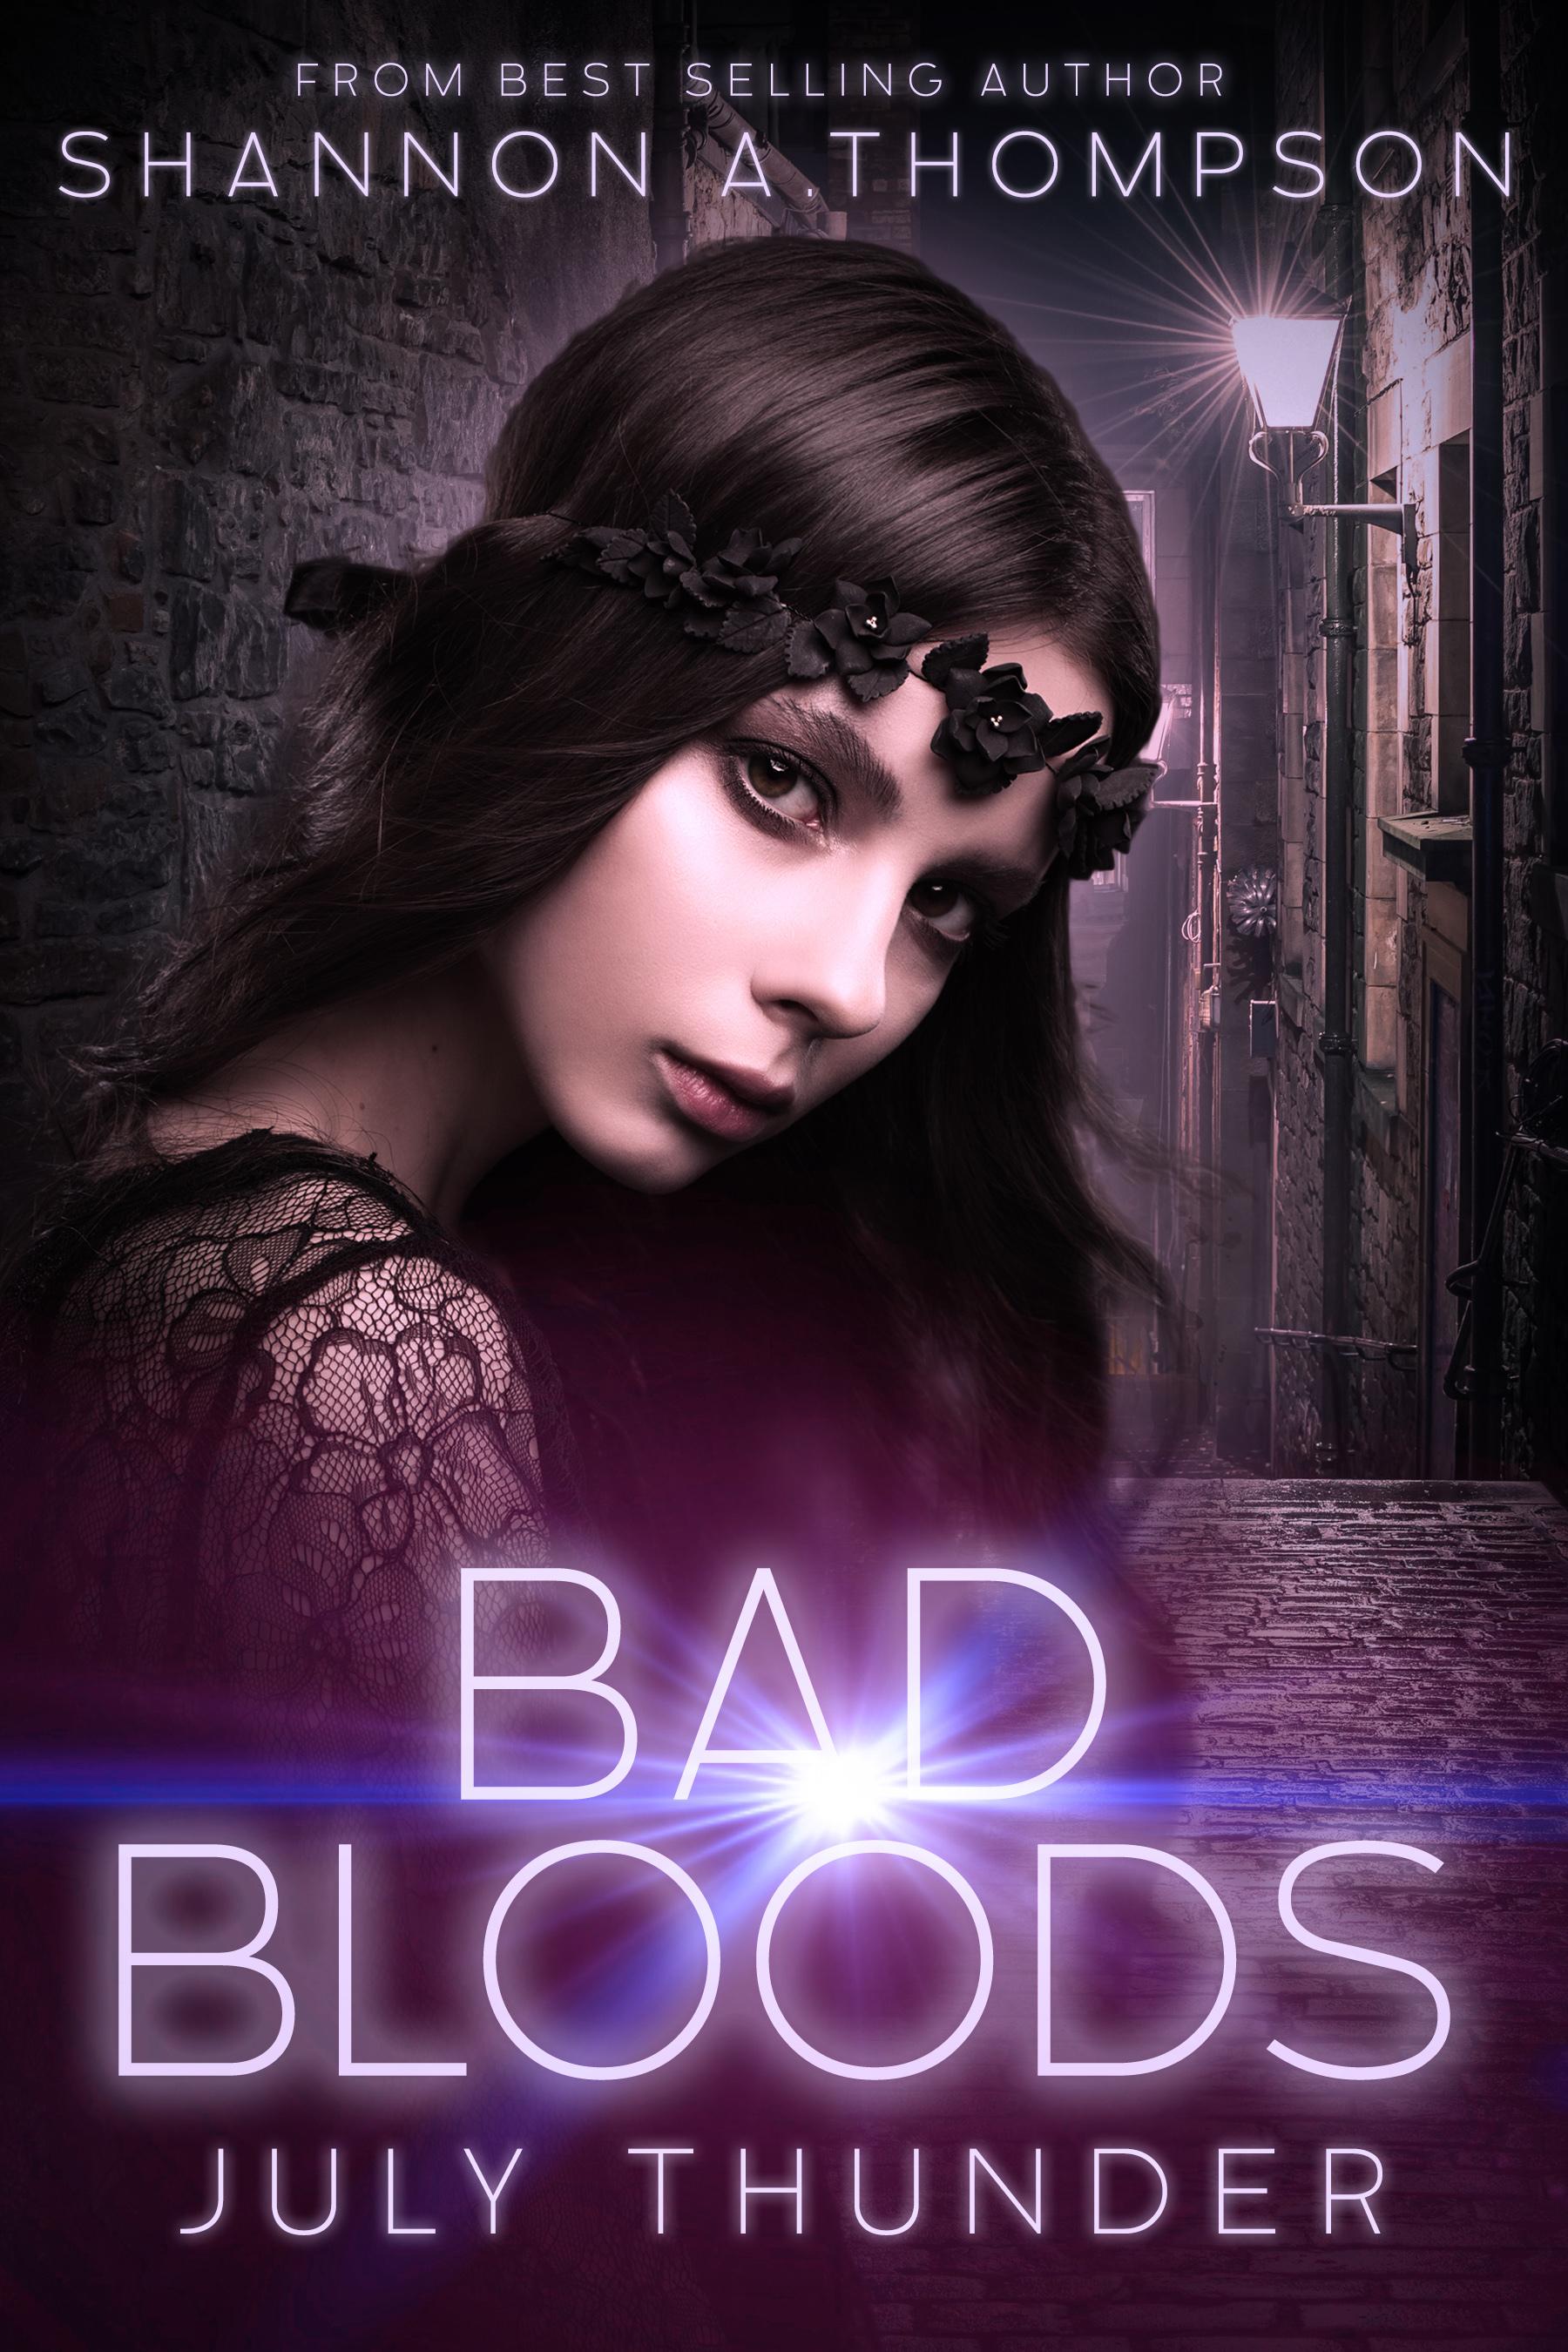 ebook-bad-bloods-july-thunder